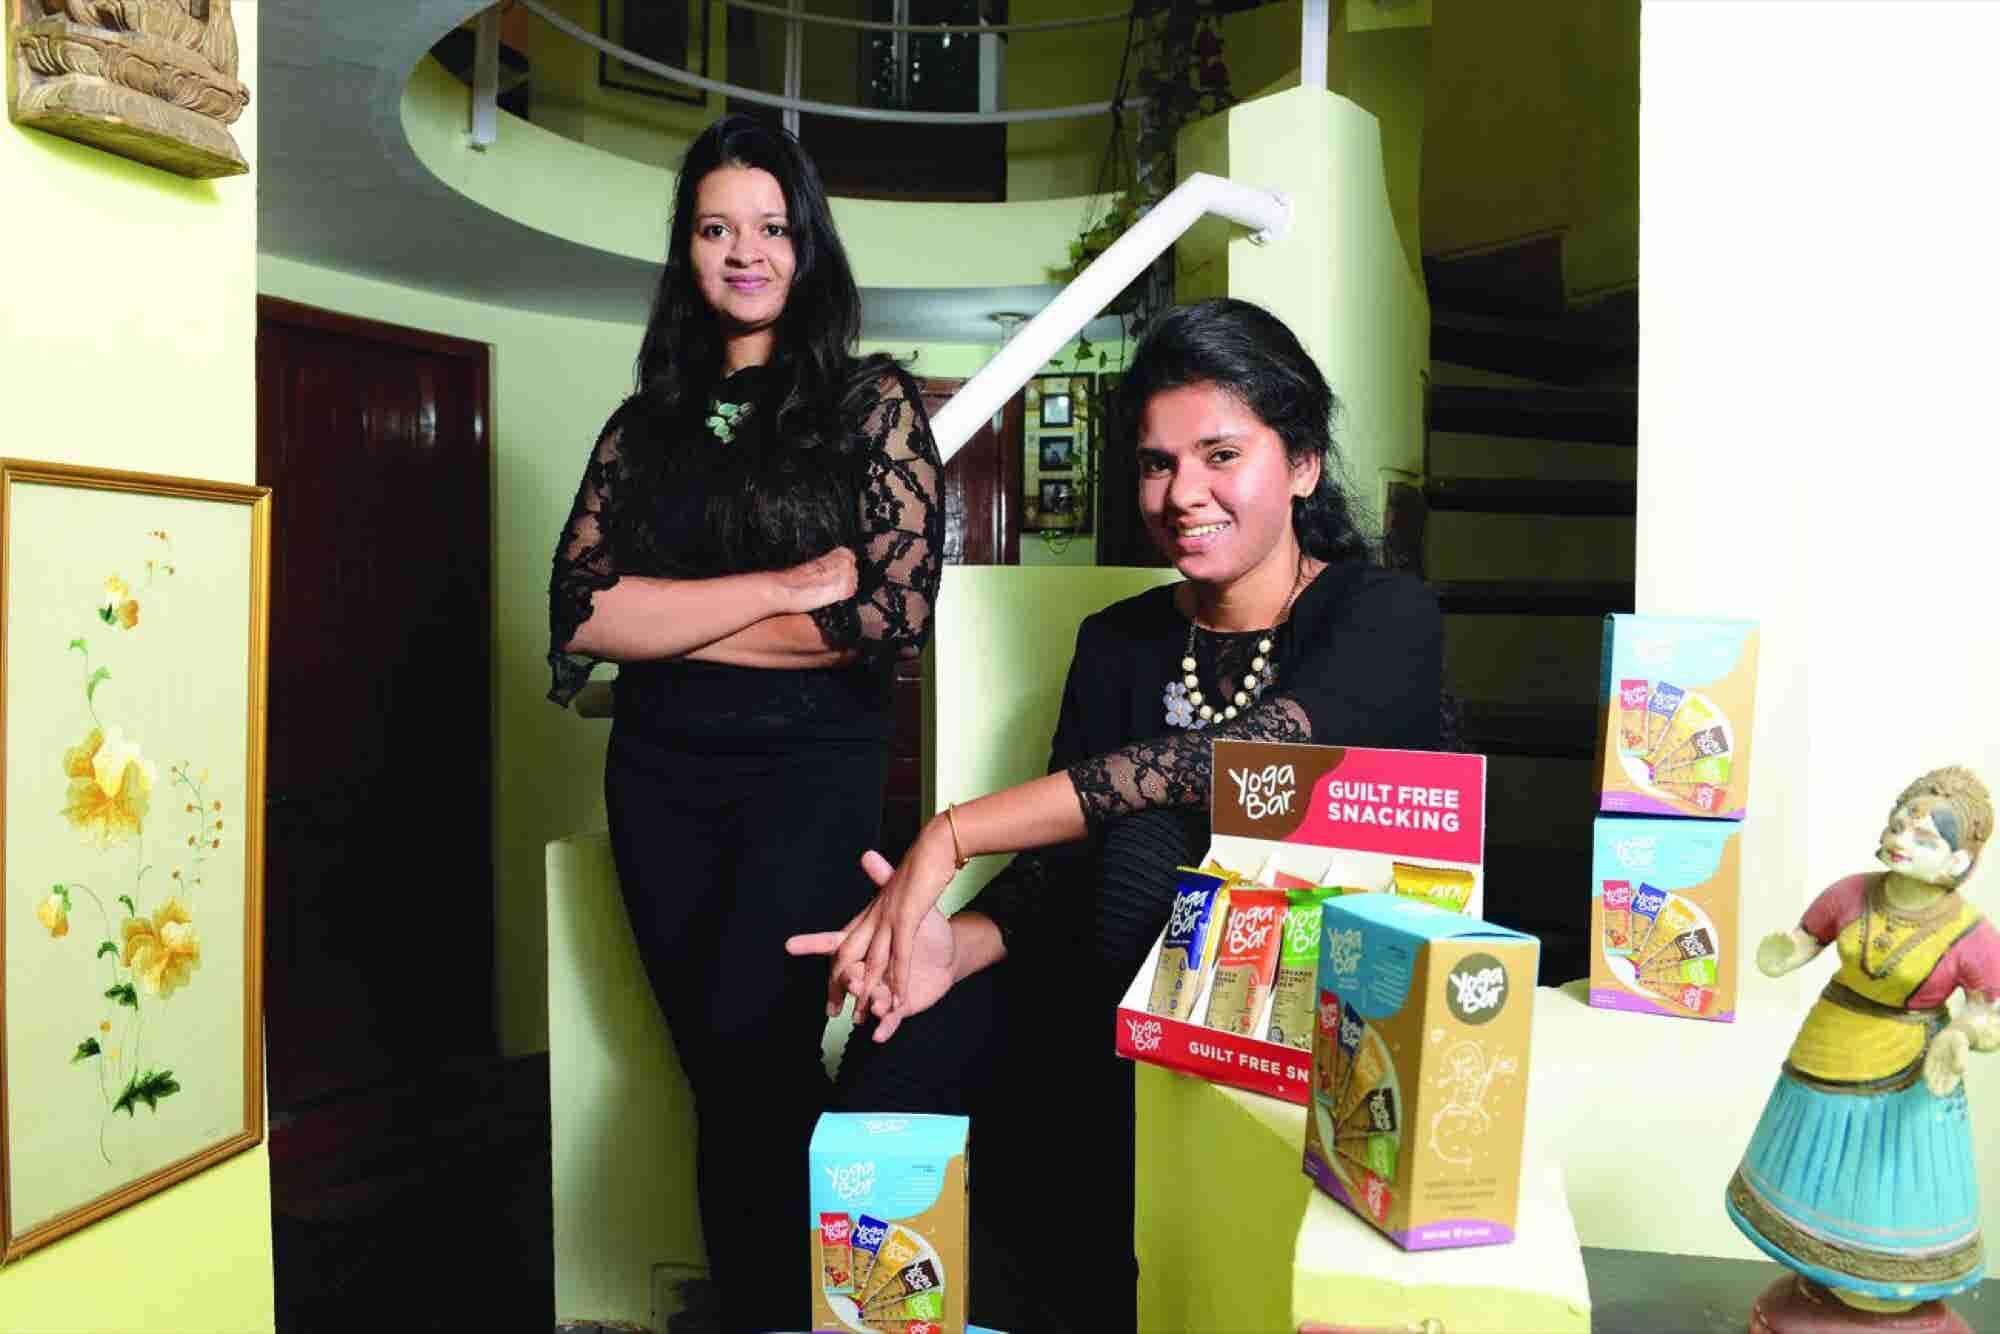 During Trekking, When Sampat Sisters Devised a Breakthrough Idea of Providing Energy Through Bars